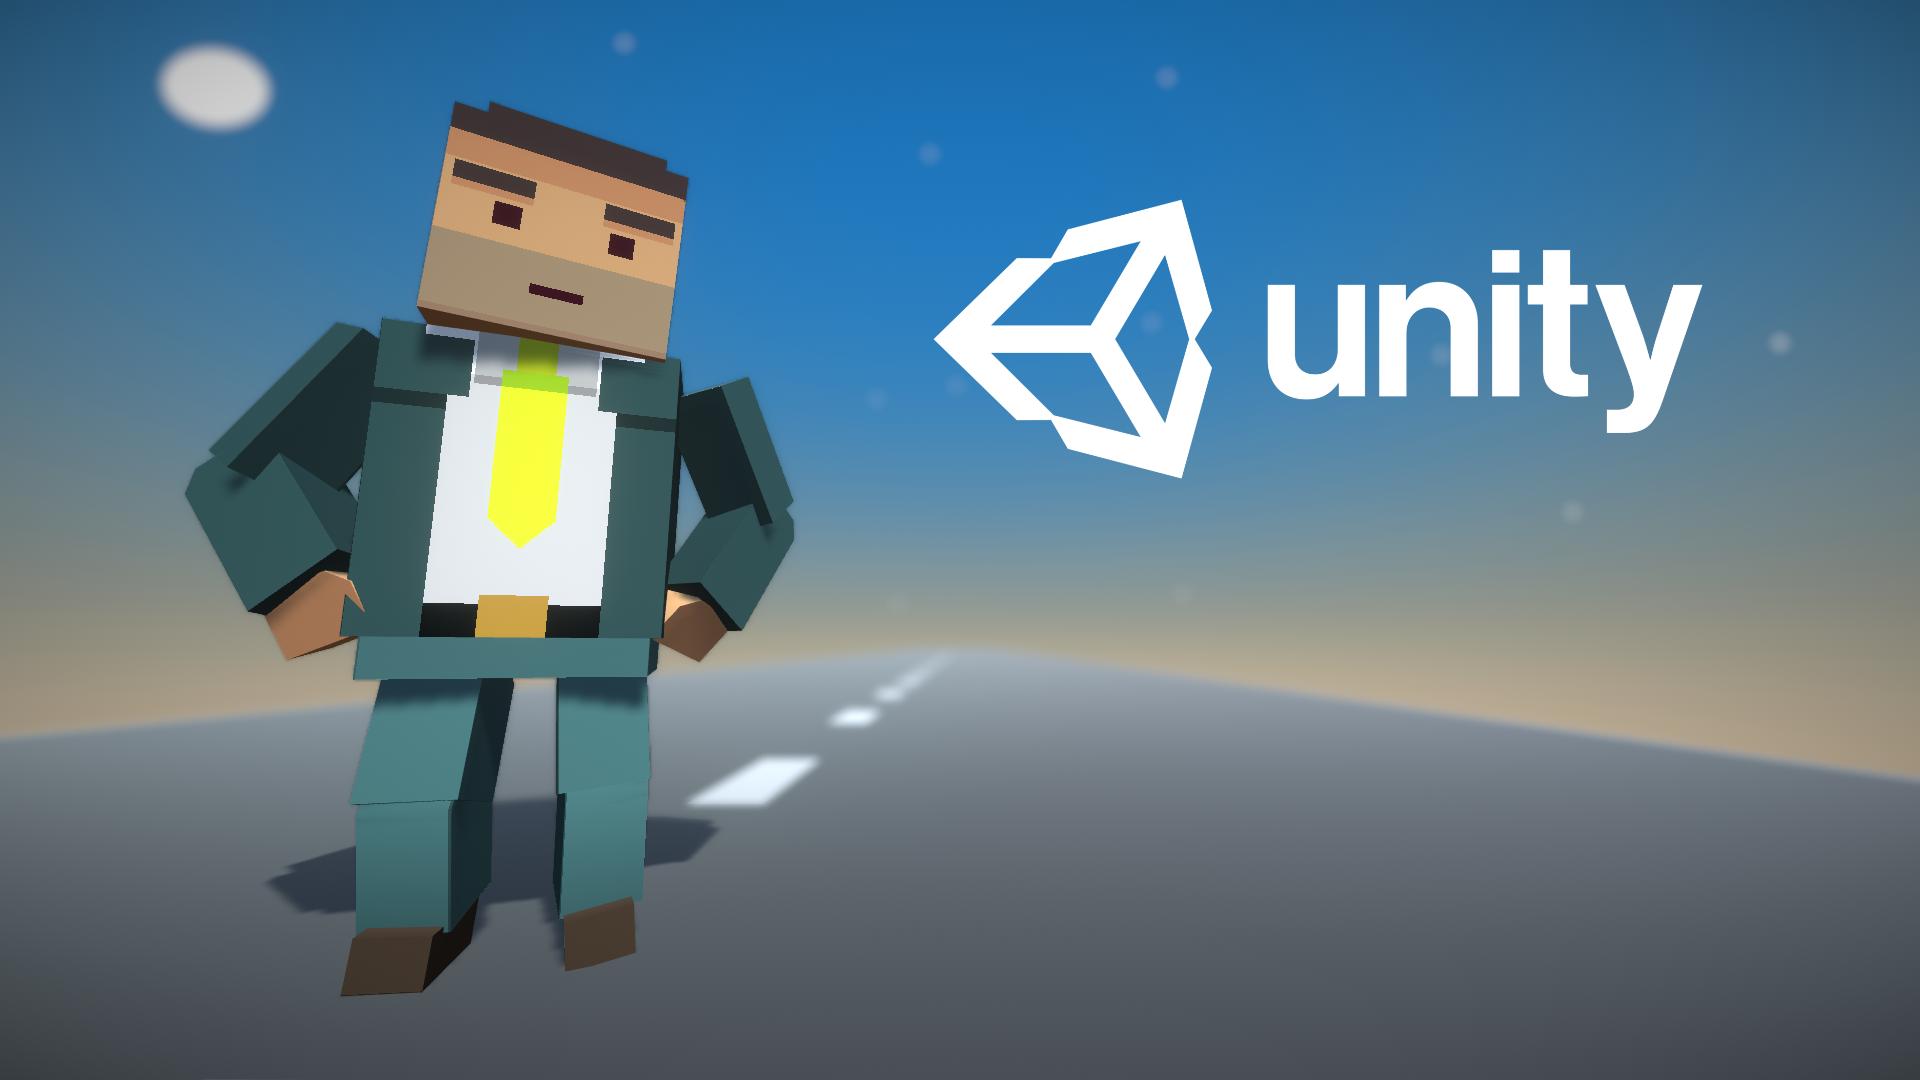 Intro to C# Scripting in Unity 3D